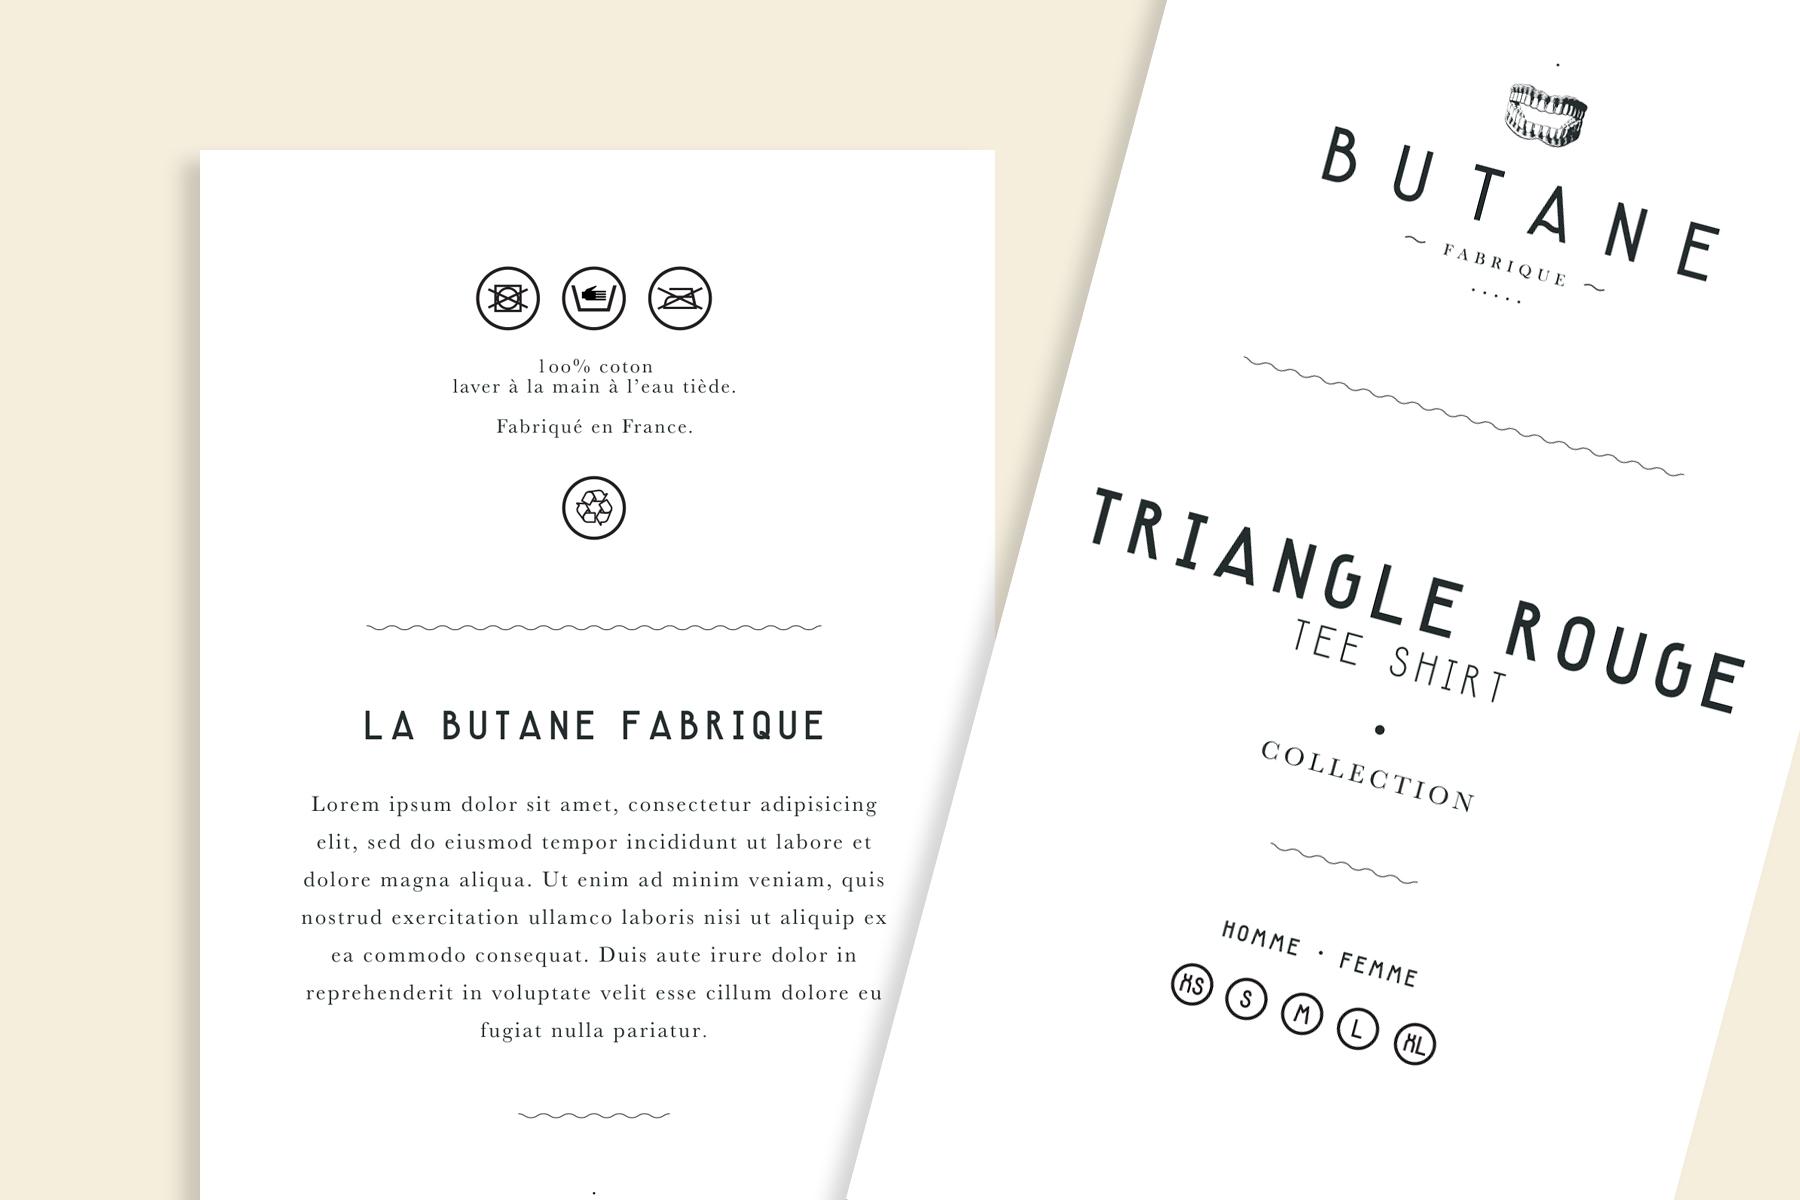 butane_etiquette